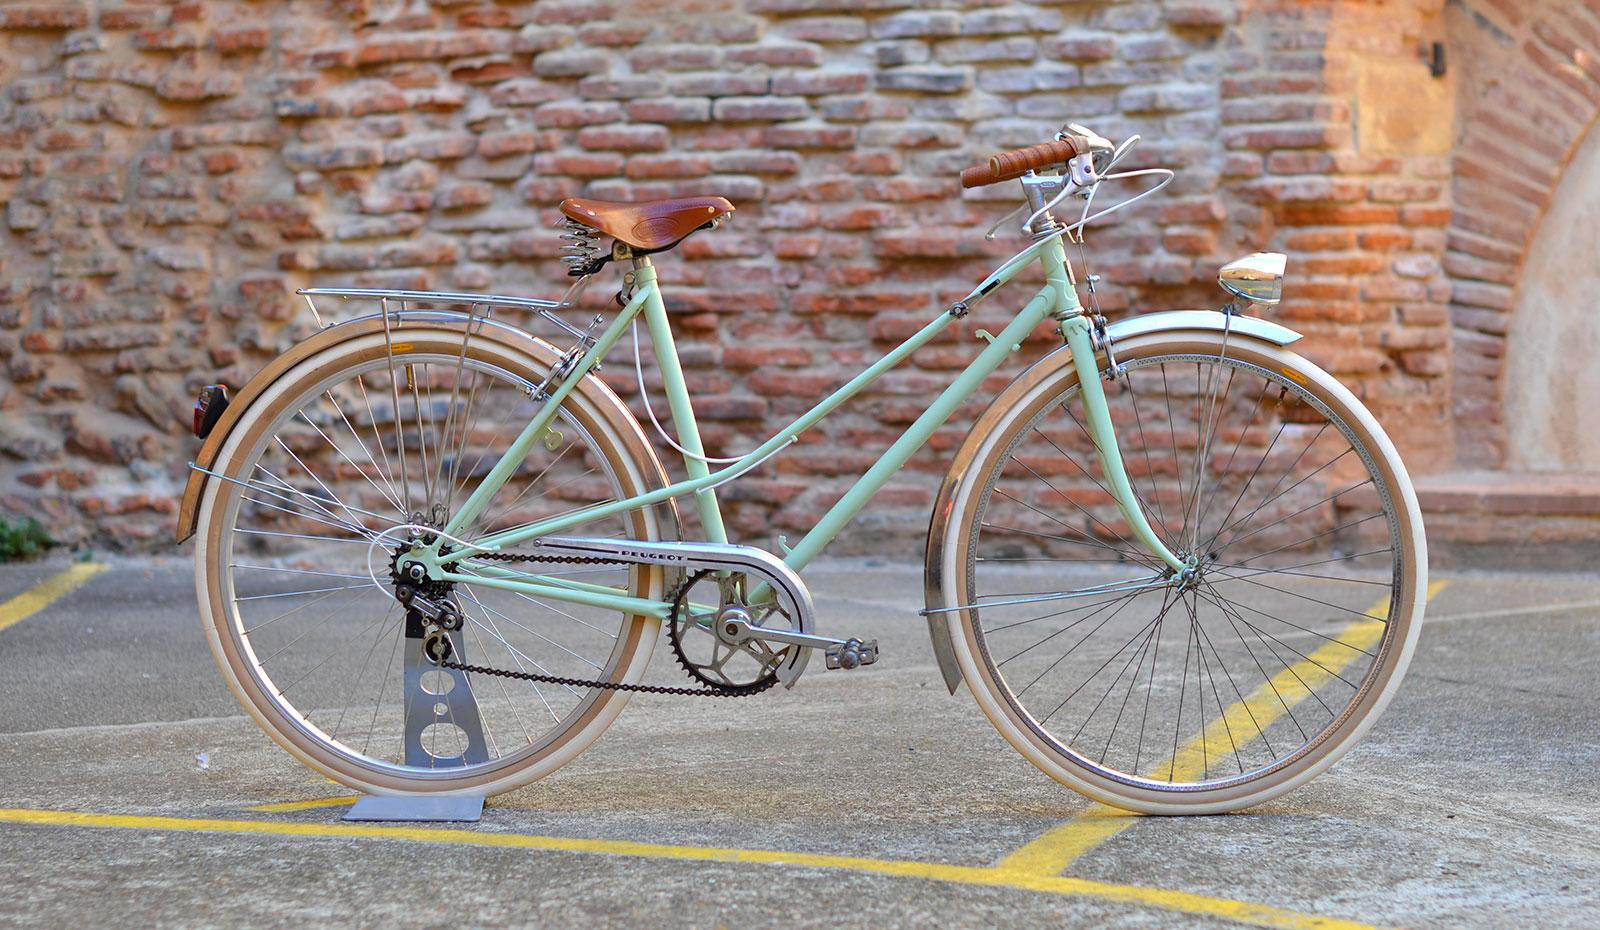 Velo Peugeot Femme Vintage